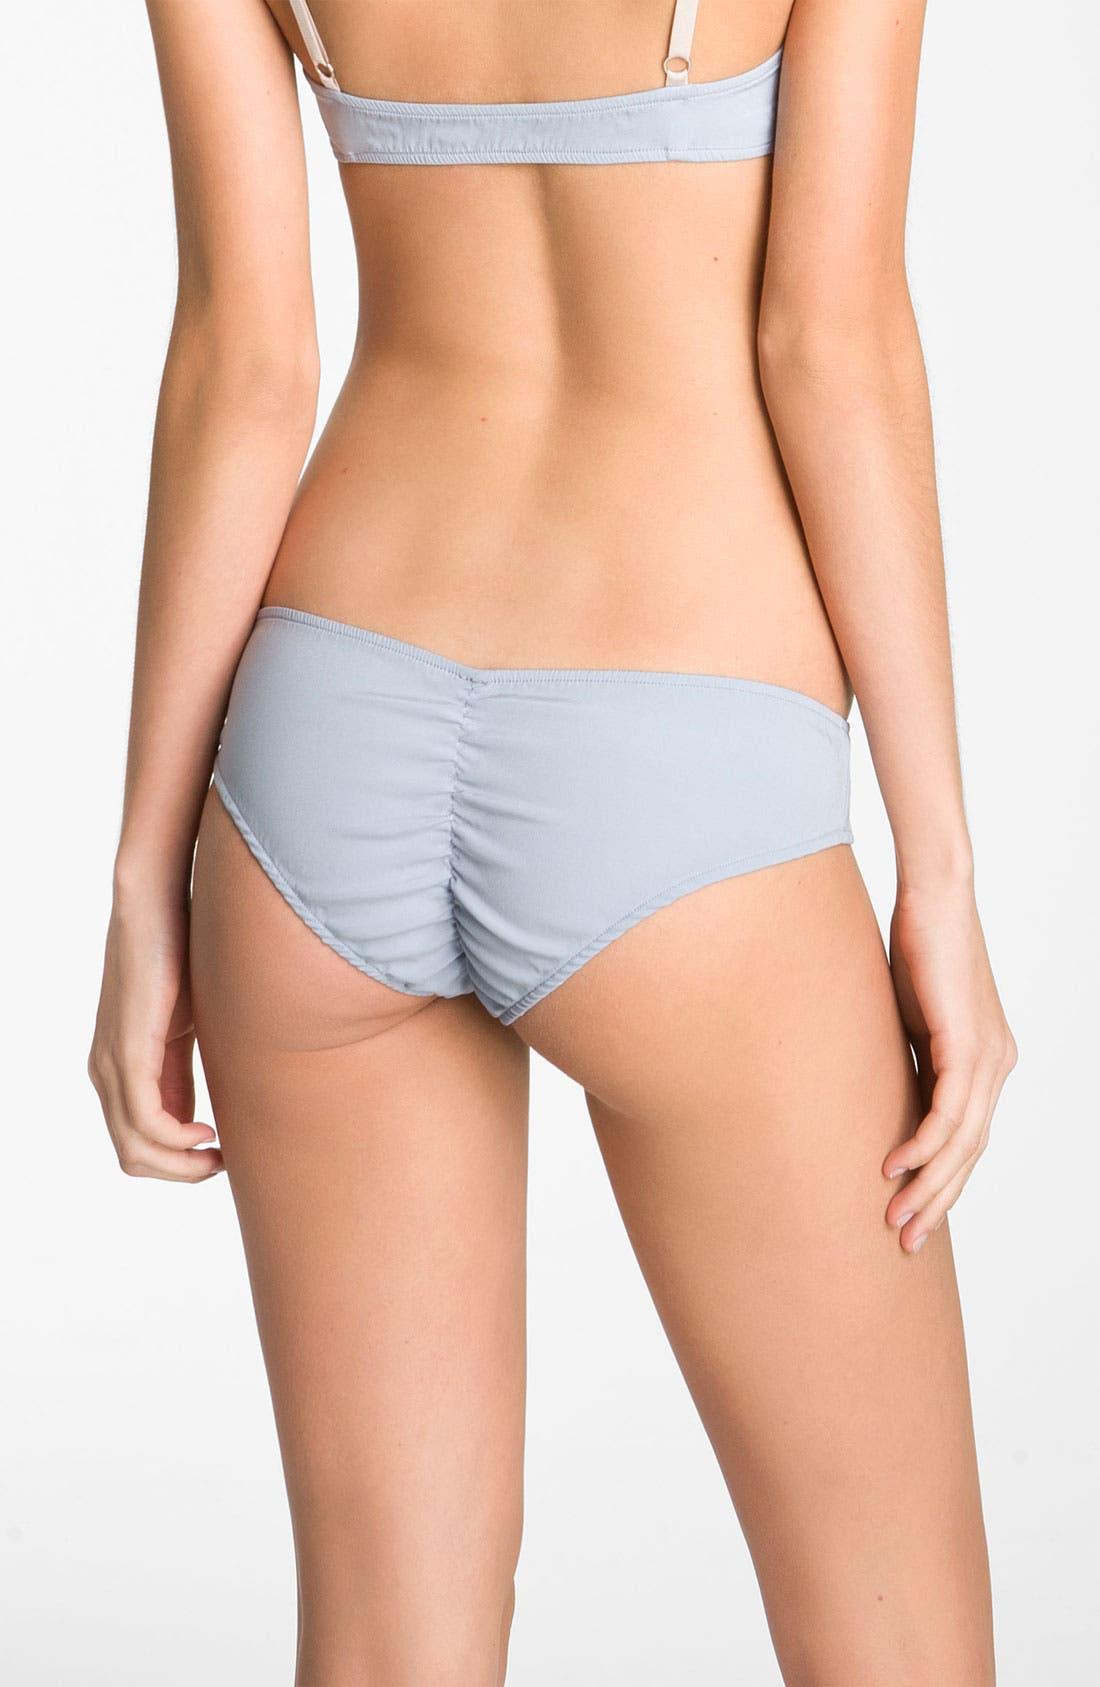 Alternate Image 2  - Zinke 'Pow Wow' Panties